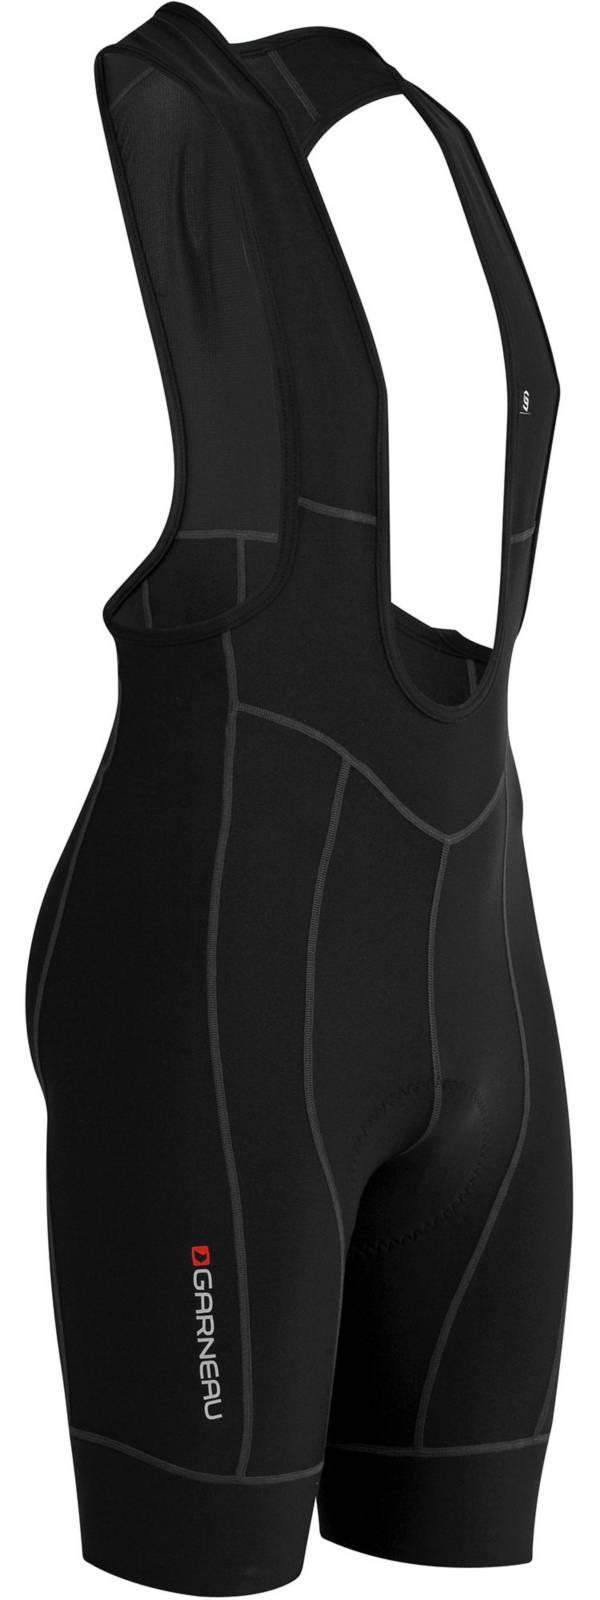 New Louis Garneau Men/'s Fit Sensor 2 Padded Compression Bike Sho.. Breathable